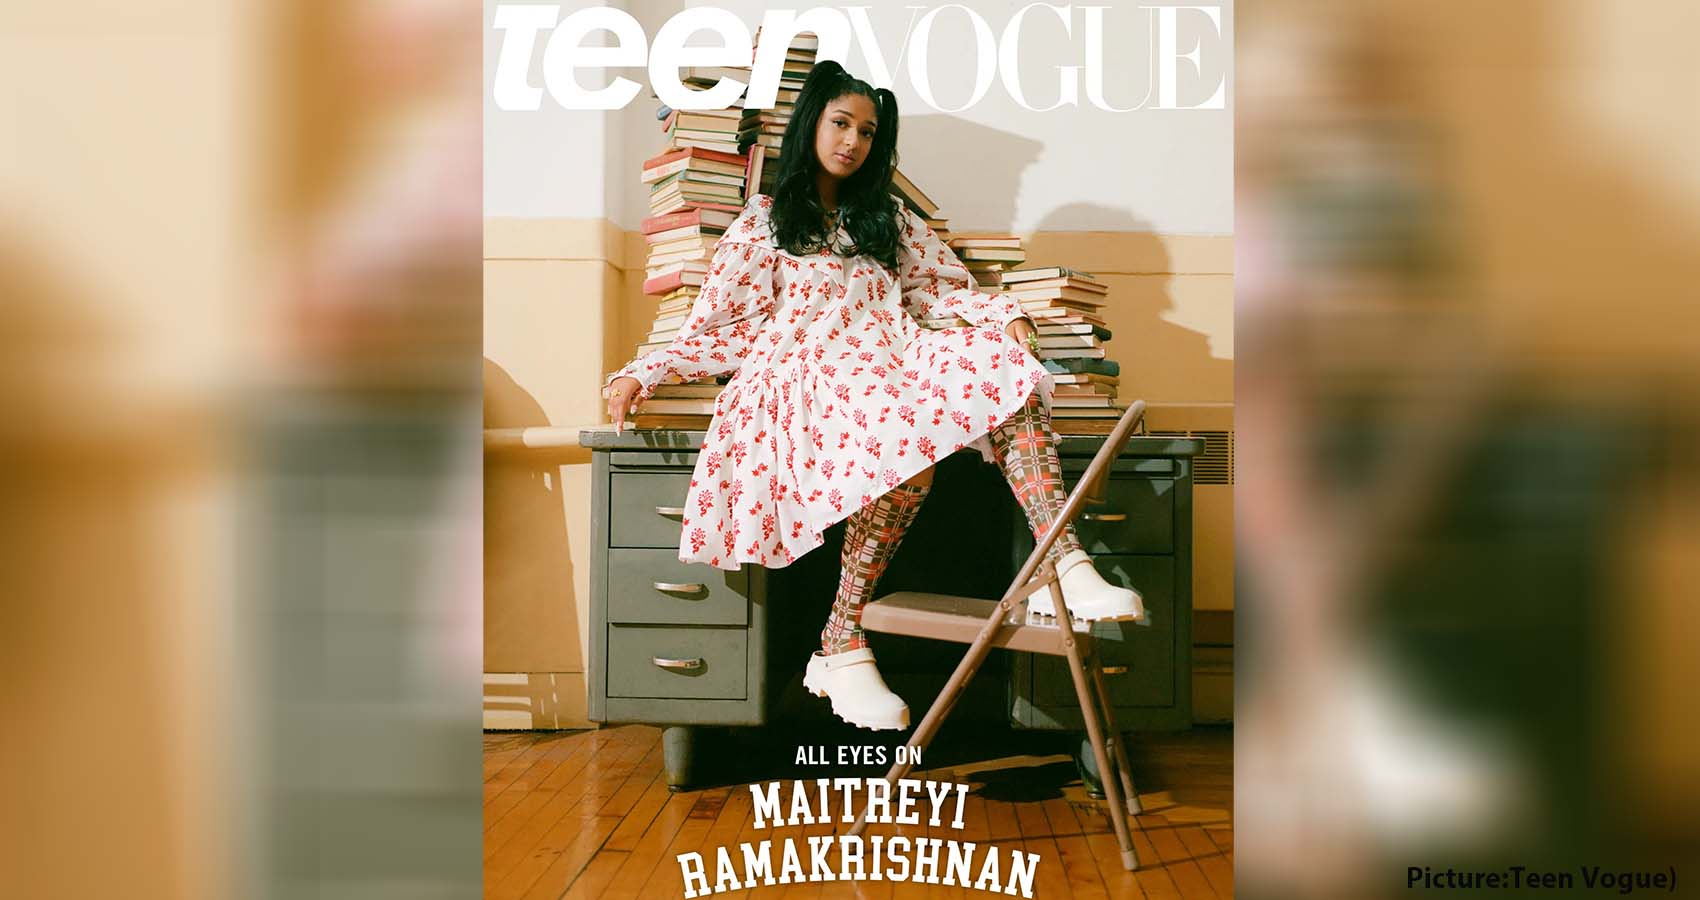 Maitreyi Ramakrishnan On Teen Vogue Cover